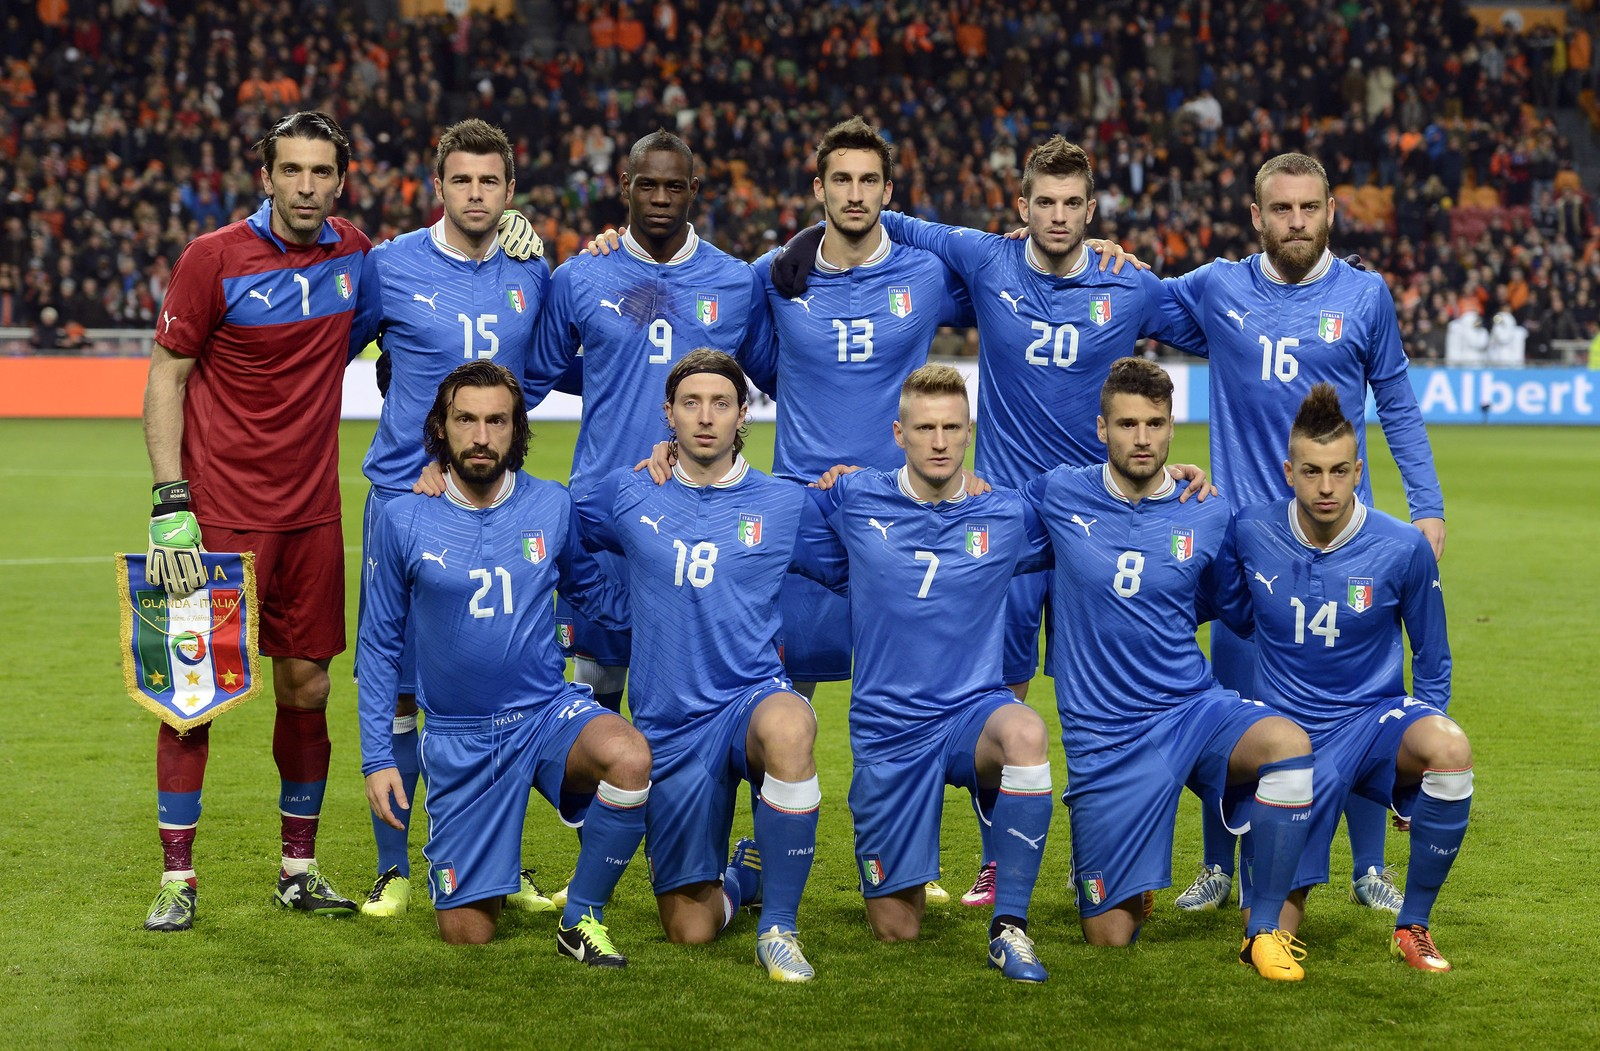 PES 2014: la Squadra Azzurra (Buffon, Balotelli, Pirlo…) en images!